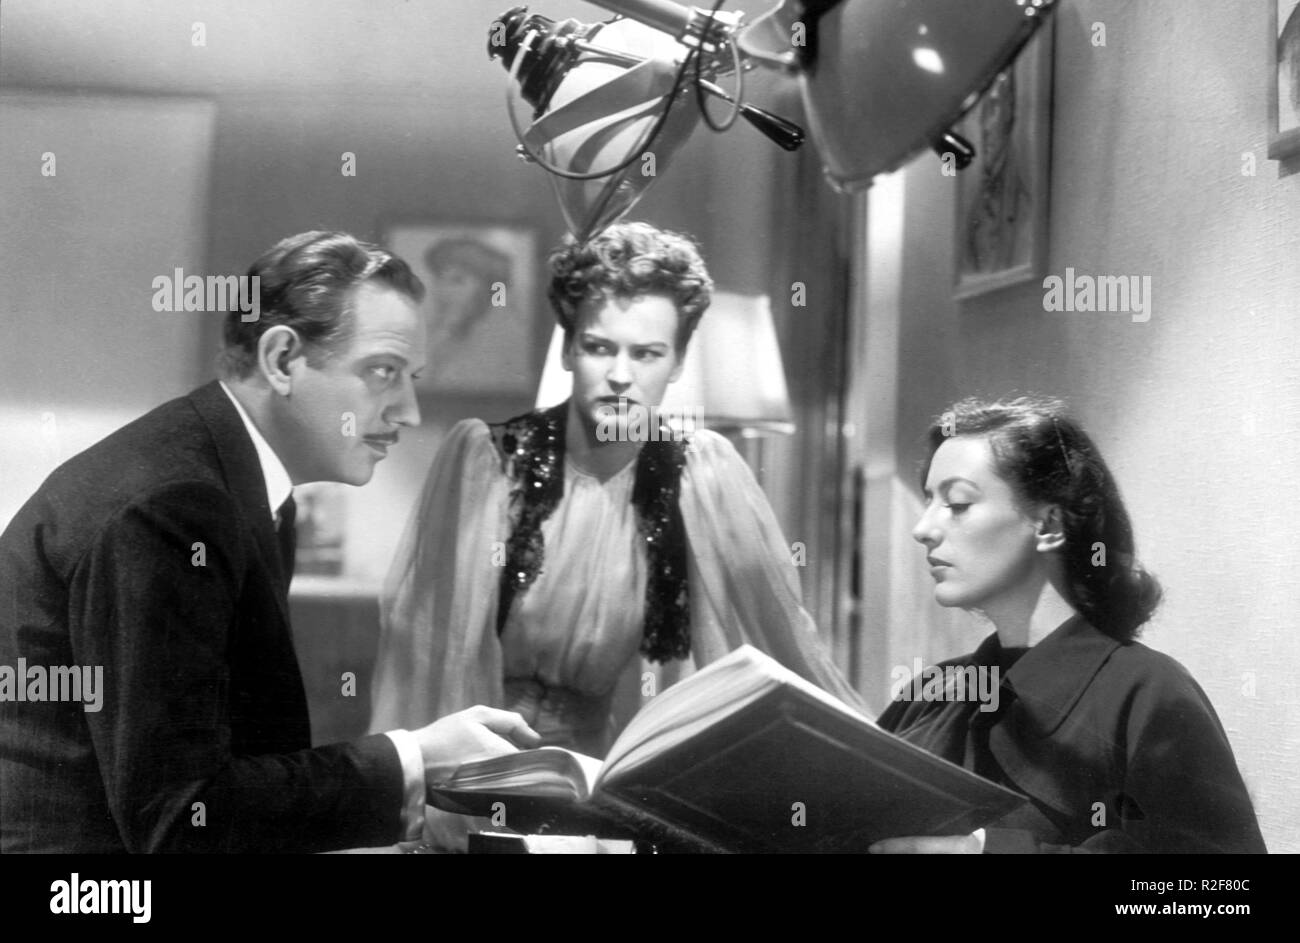 Nicolas Coster (born 1934),Dawn Bender Adult clips Janine Tugonon PHL,Amiah Miller